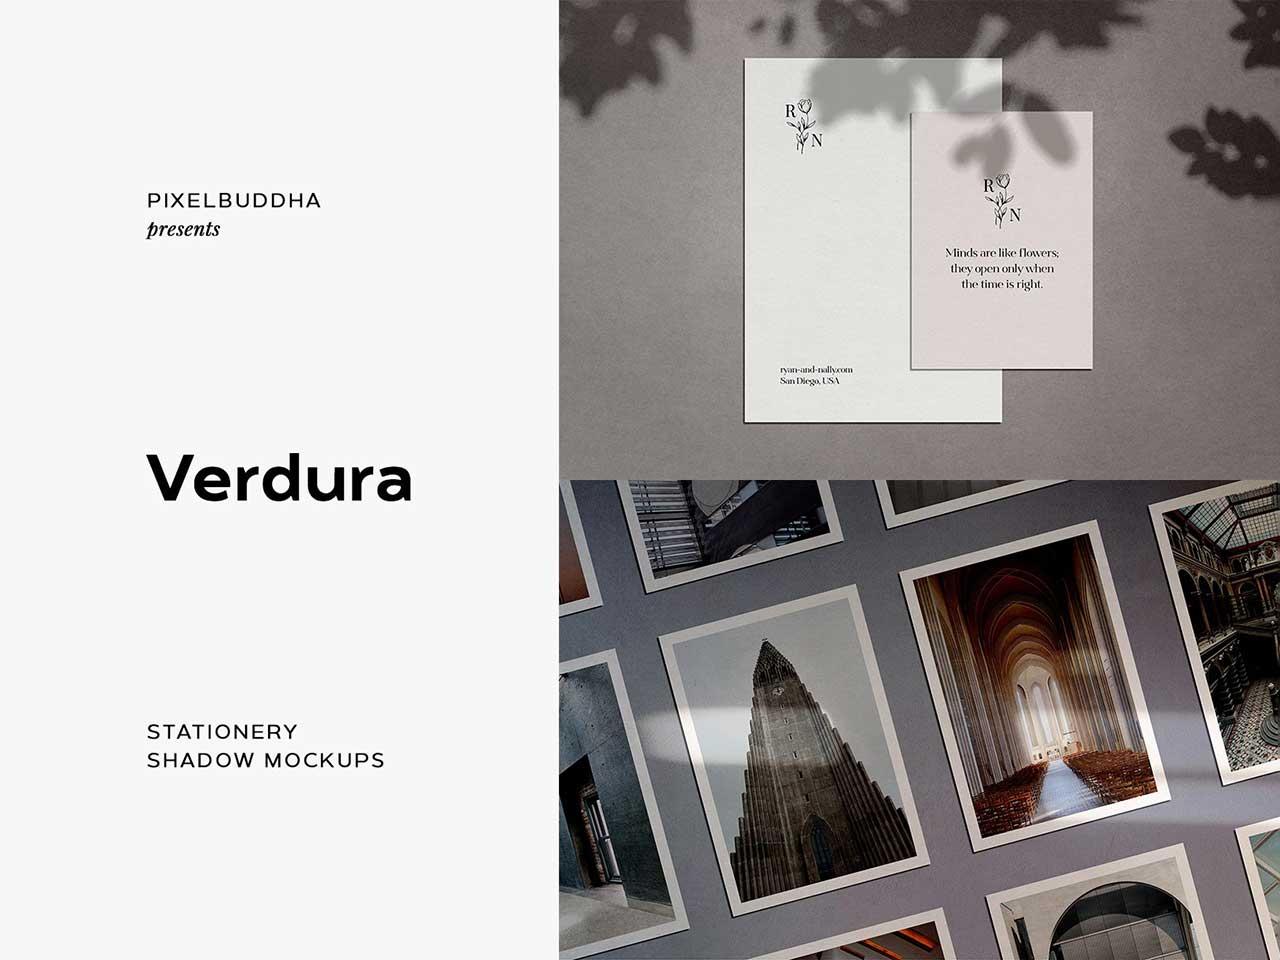 Verdura Stationery Shadow Mockups